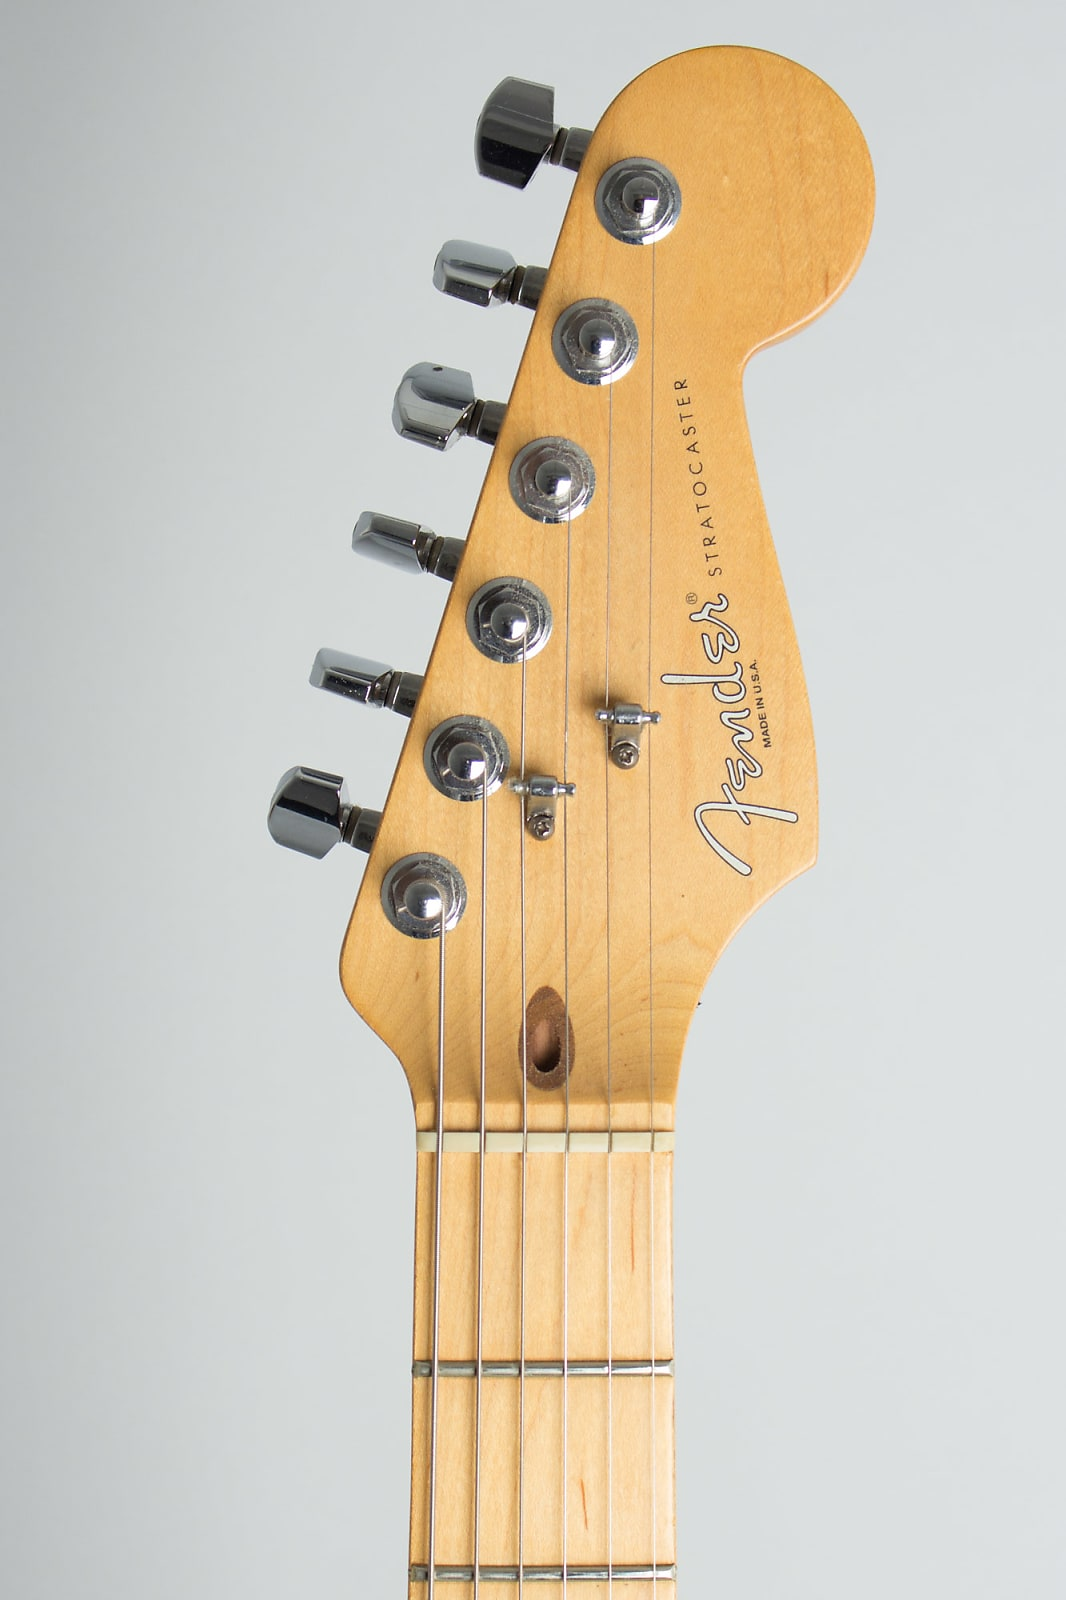 Fender  Stratocaster American Standard Solid Body Electric Guitar (1996), ser. #N6161971, original molded black plastic hard shell case.